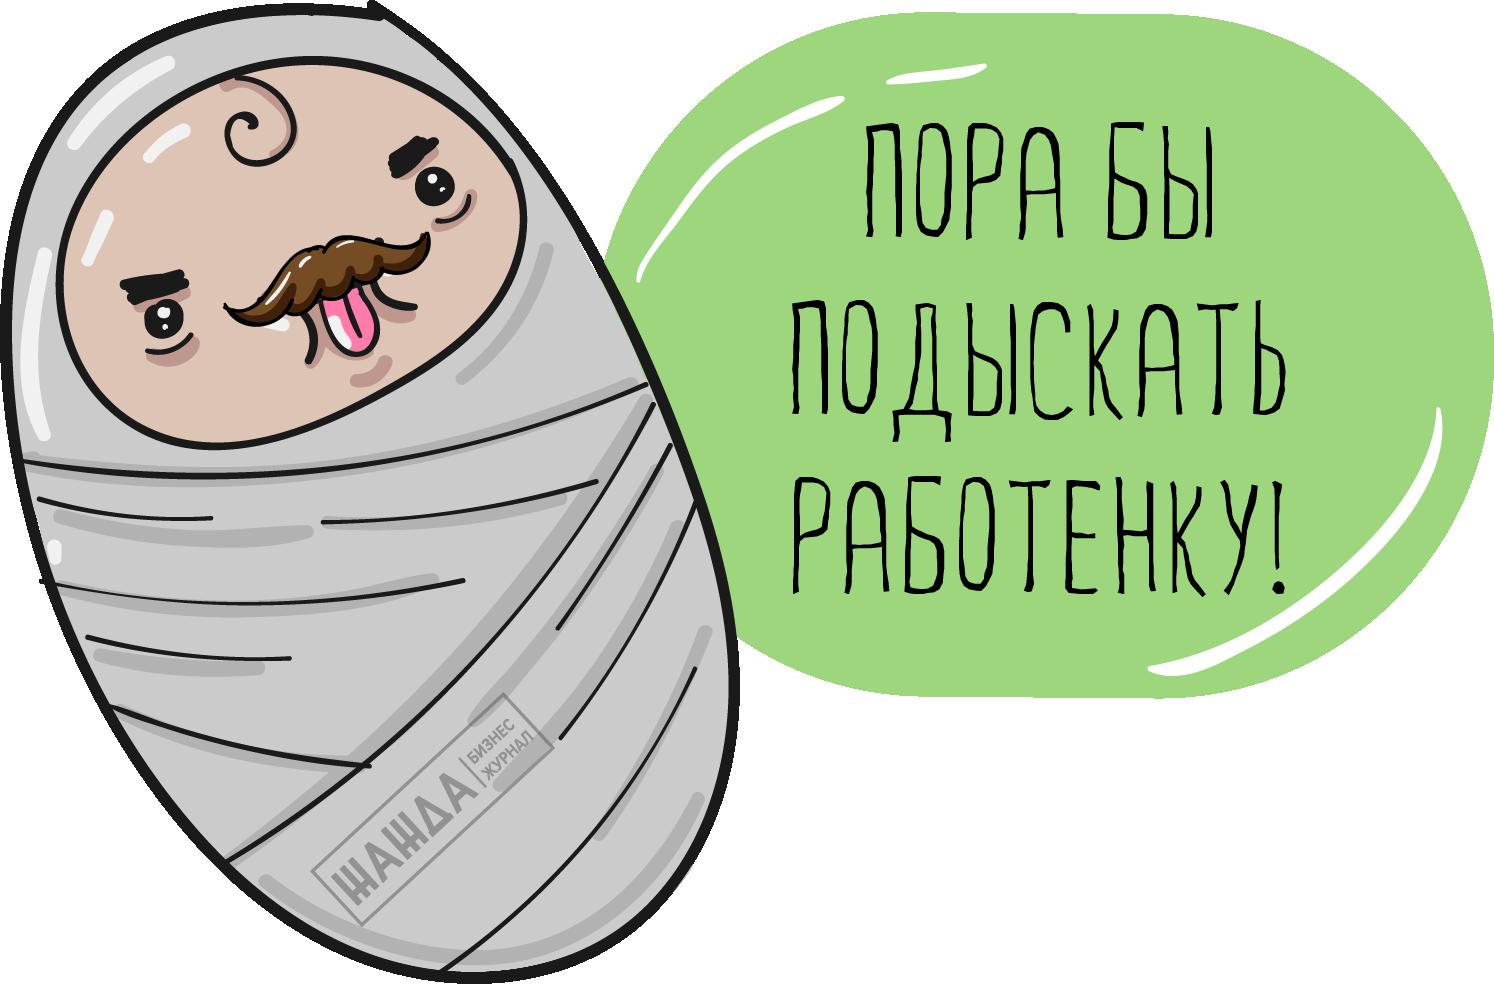 Медицинский осмотр при приеме на работу несовершеннолетних пункт приема металла в Кузьмино